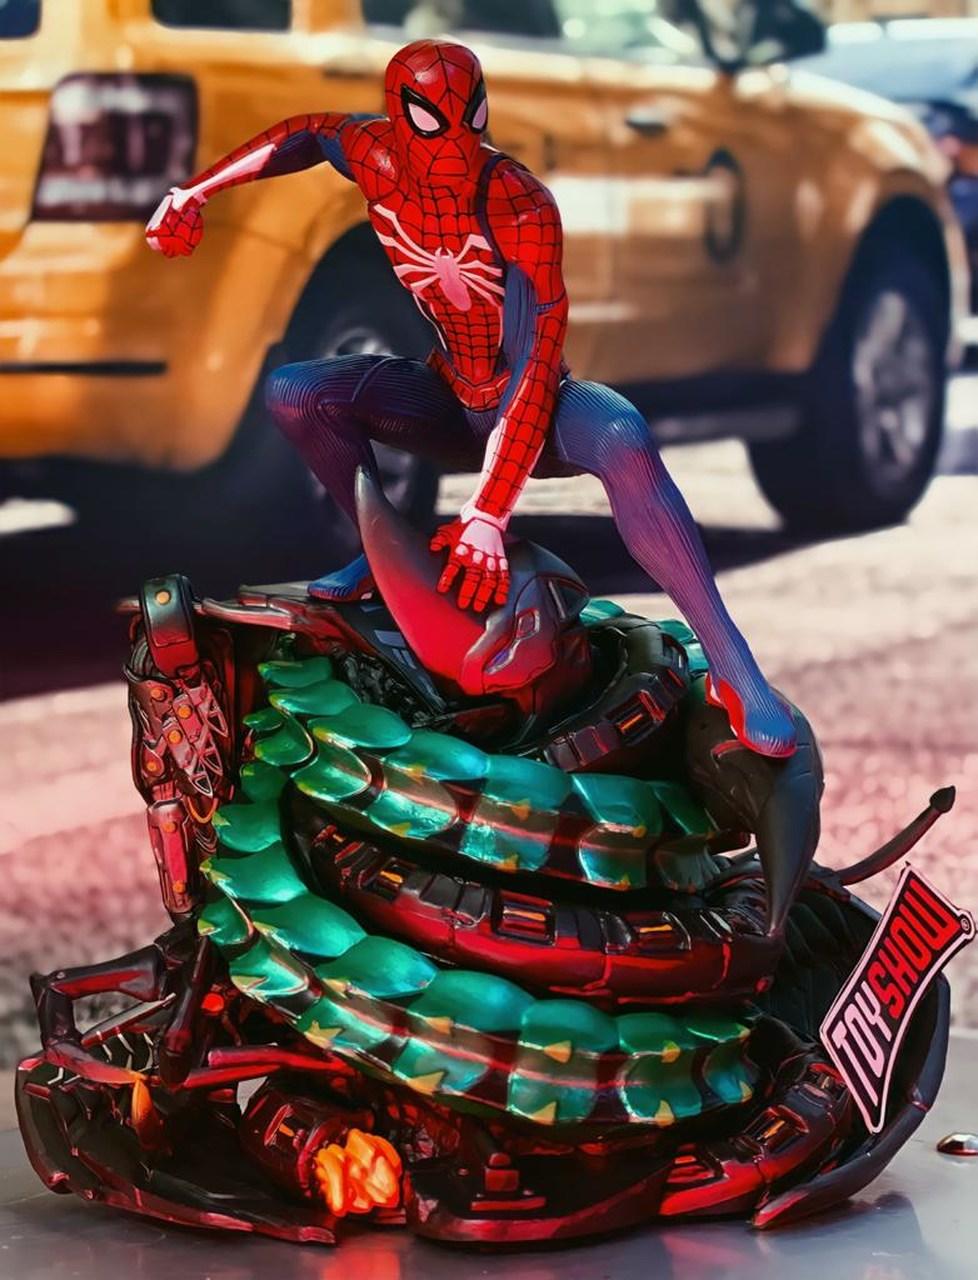 Estátua Spider-Man Homem Aranha Marvel's Spider-Man Playstation 4  Collector's Edition 20cm - EVALI